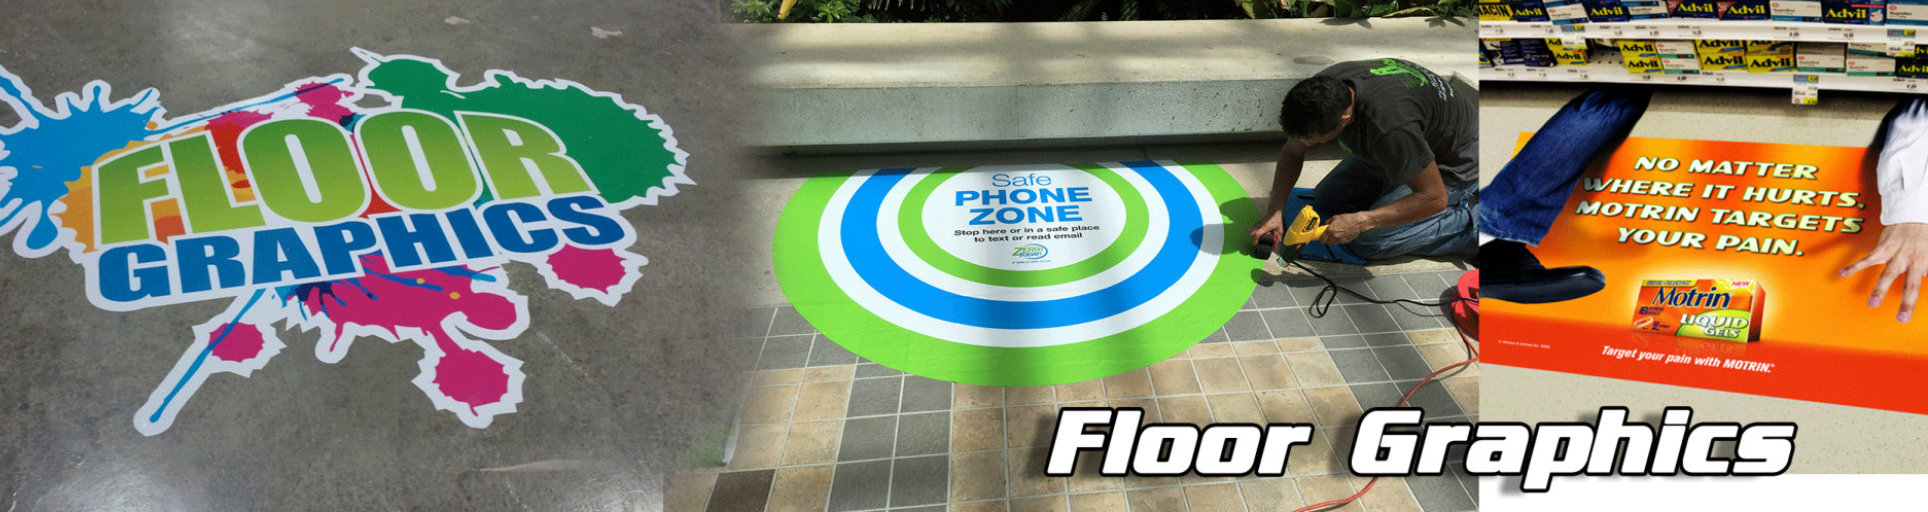 a man putting floor graphics